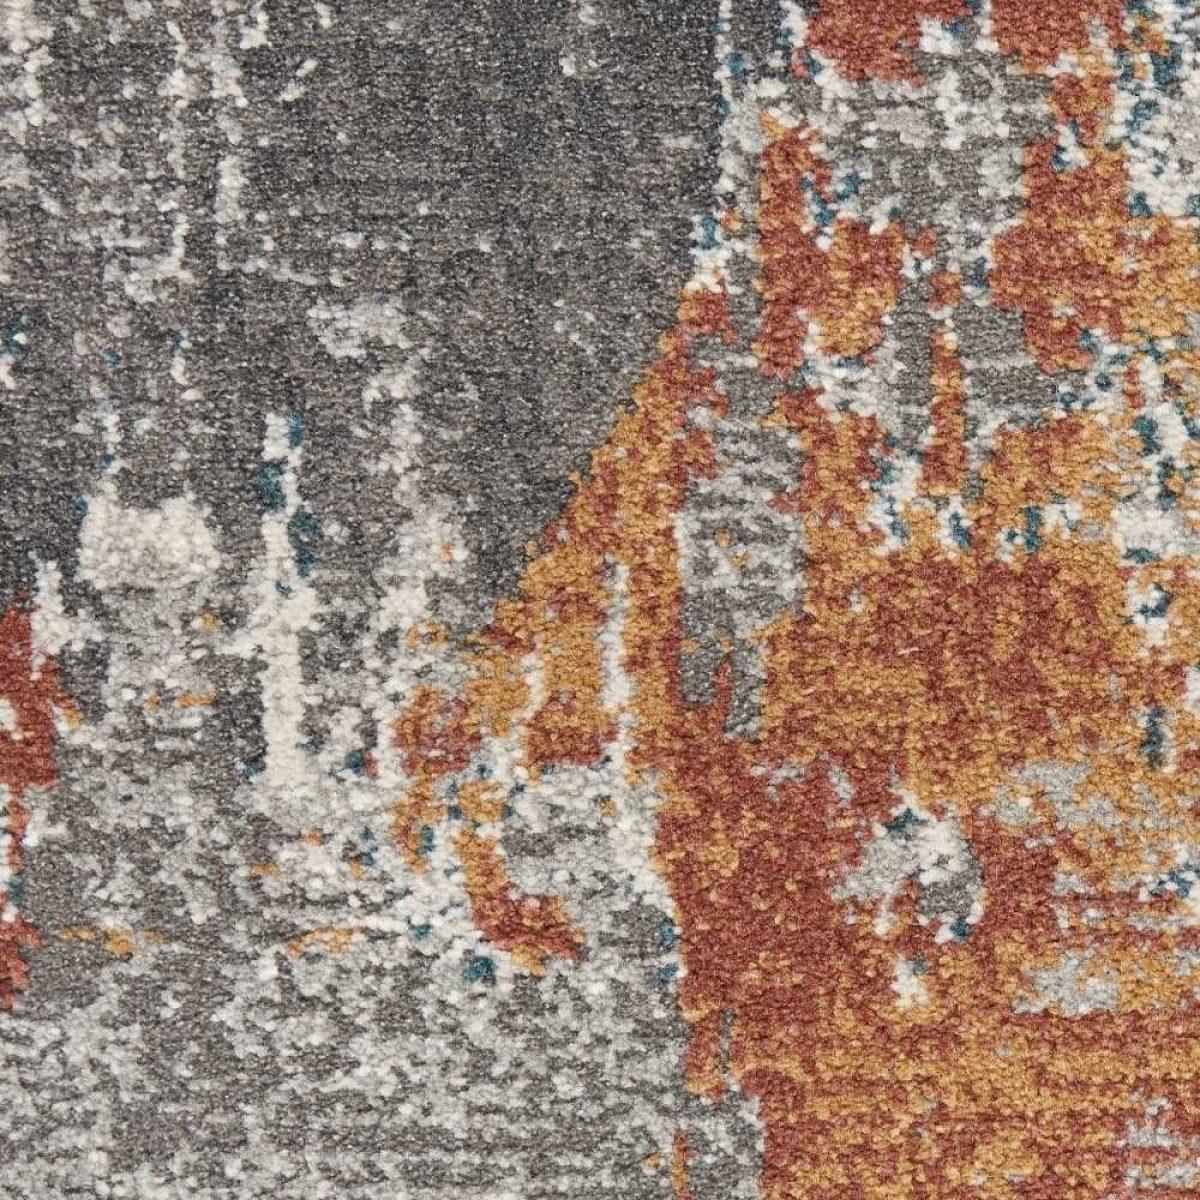 Tangr tnr06 grymt grey multi 5x7 099446783202 swatch